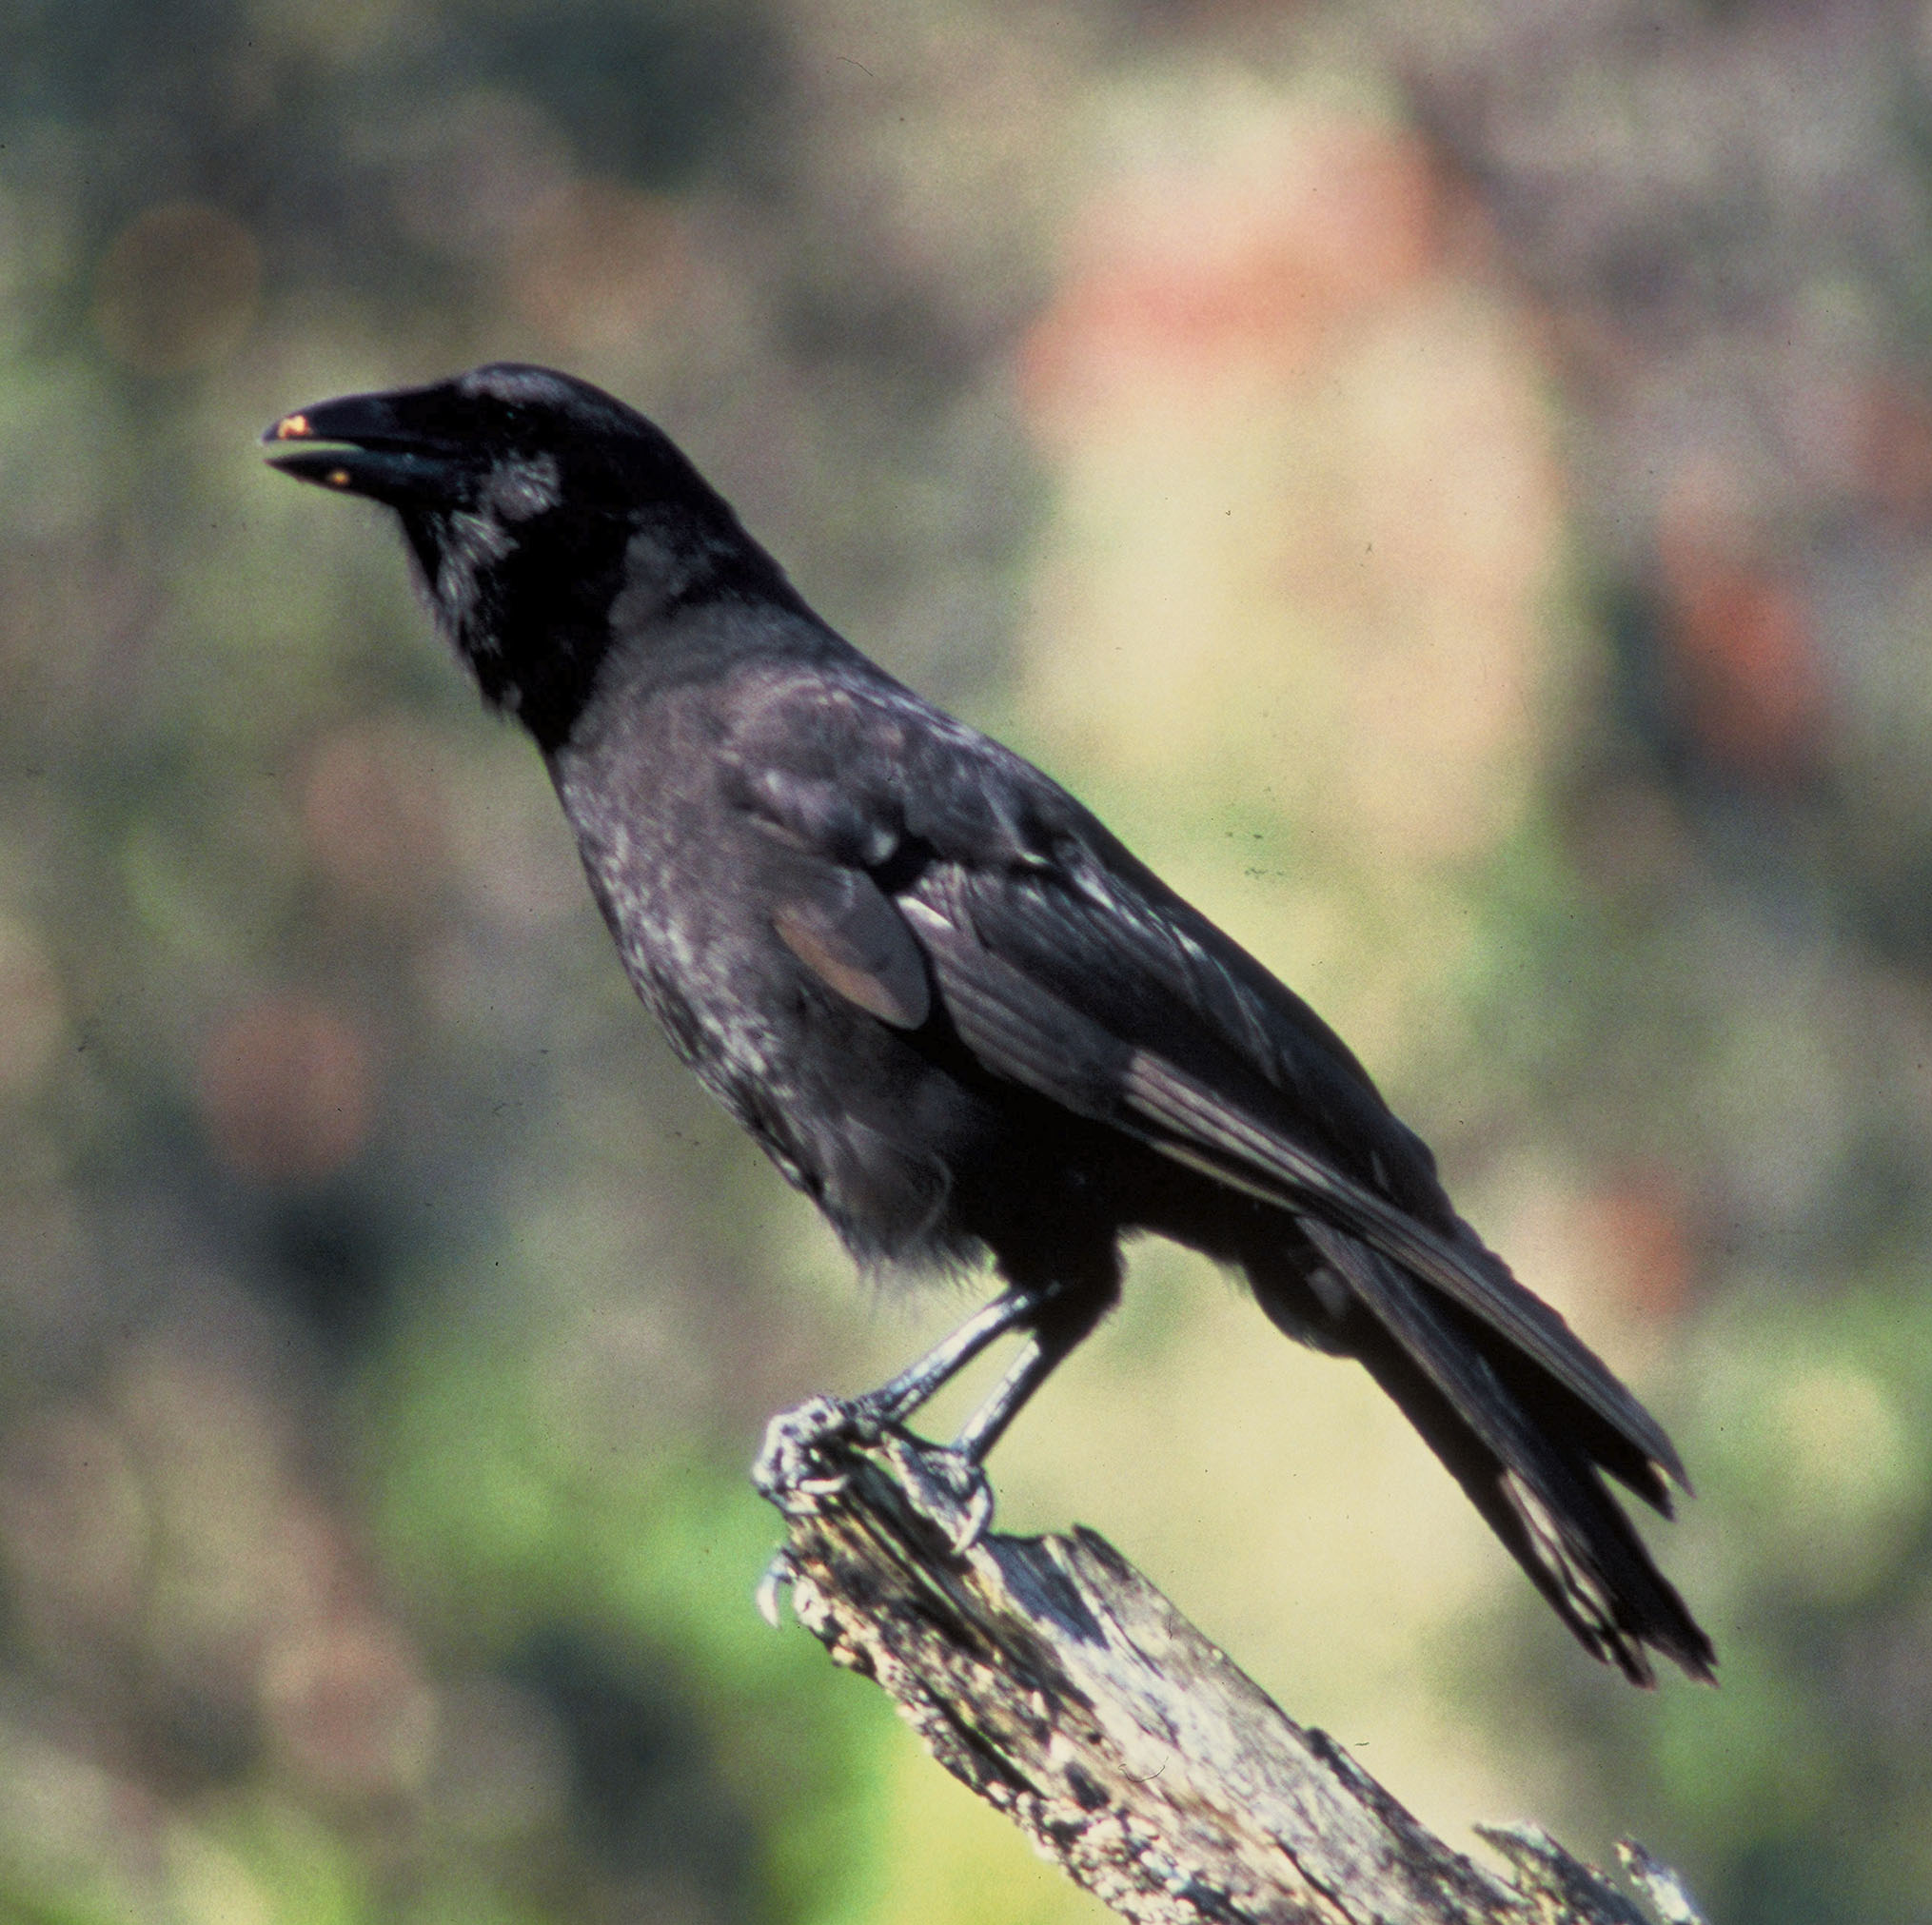 Corvus_hawaiiensis_FWS.jpg